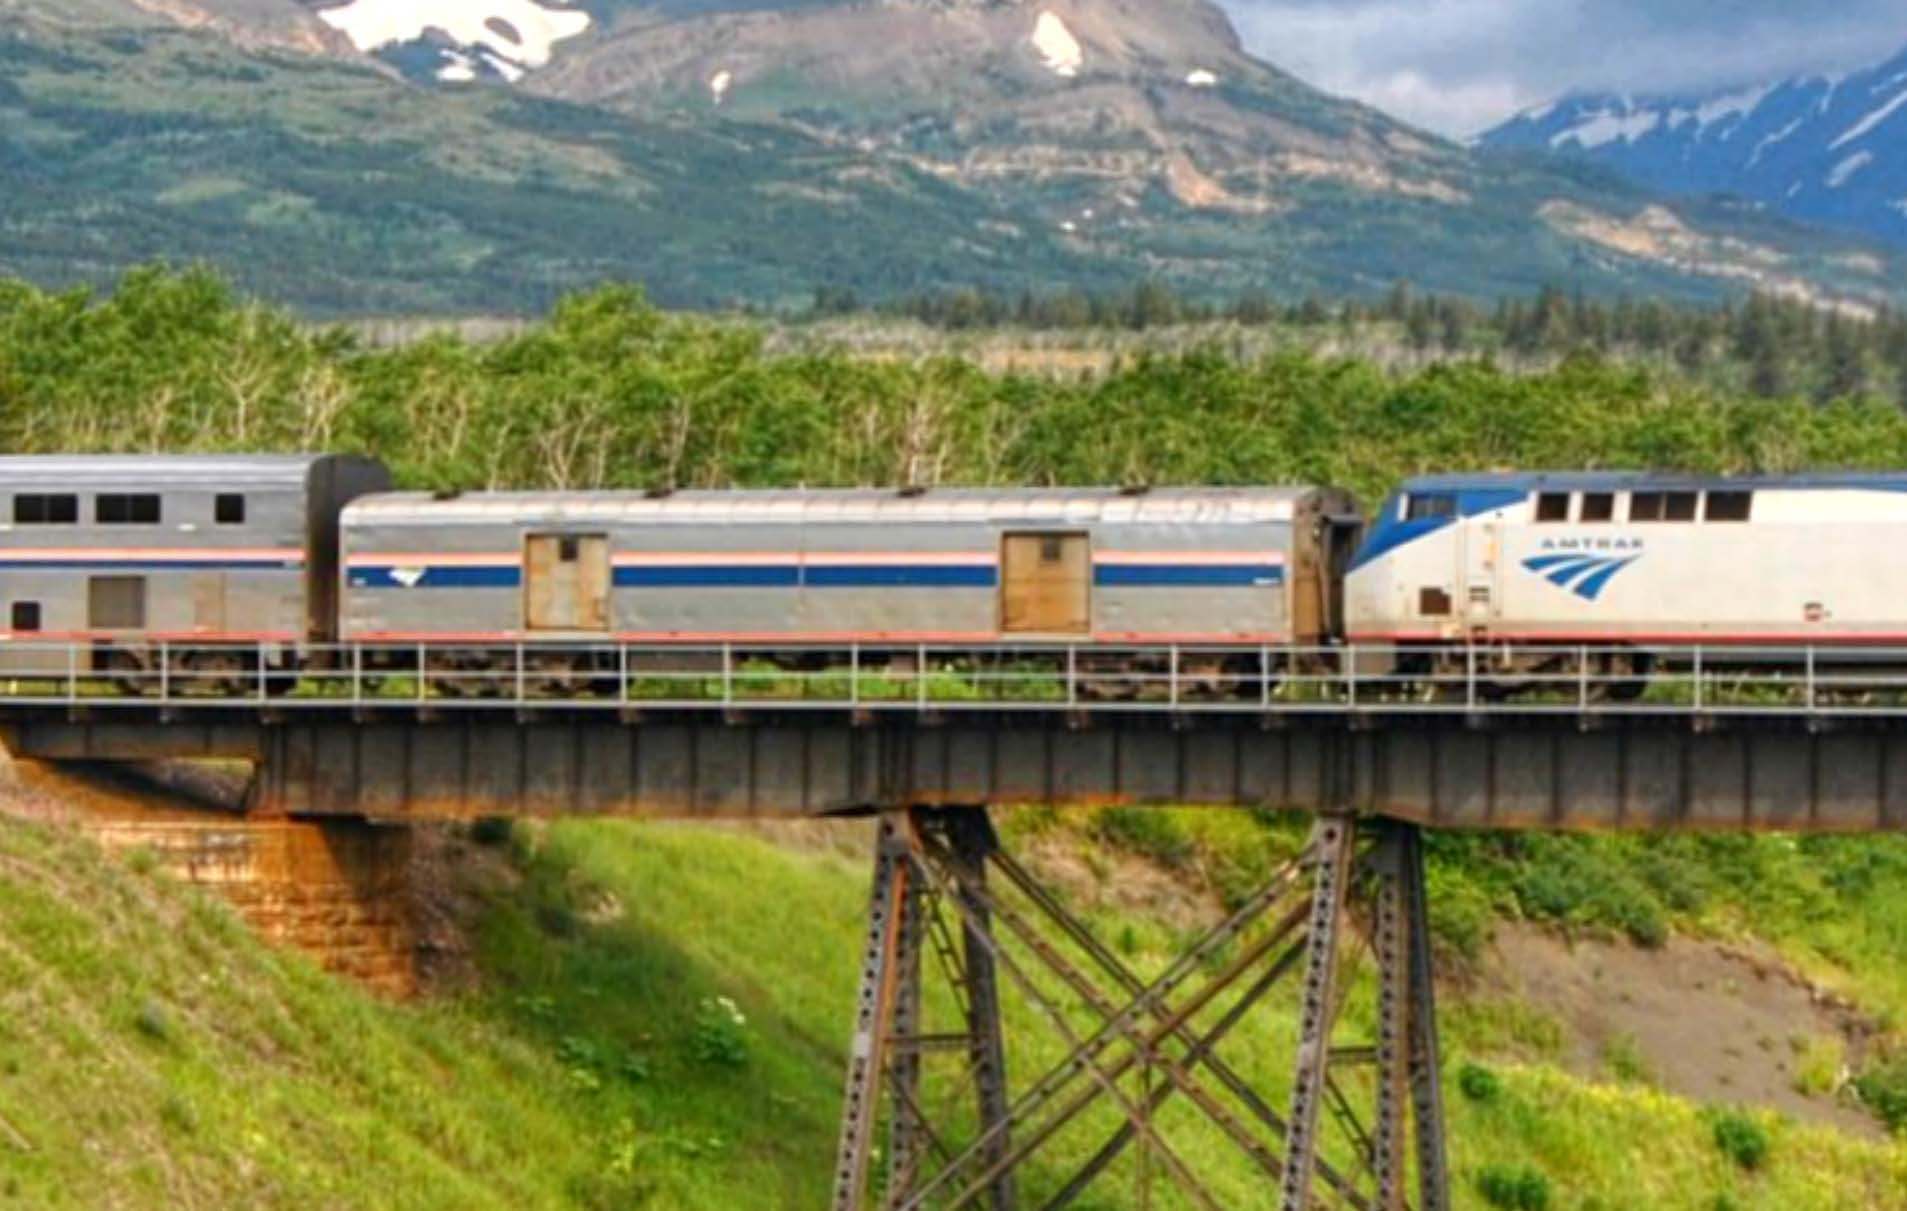 Page 32 of Amerika verkennen met de trein